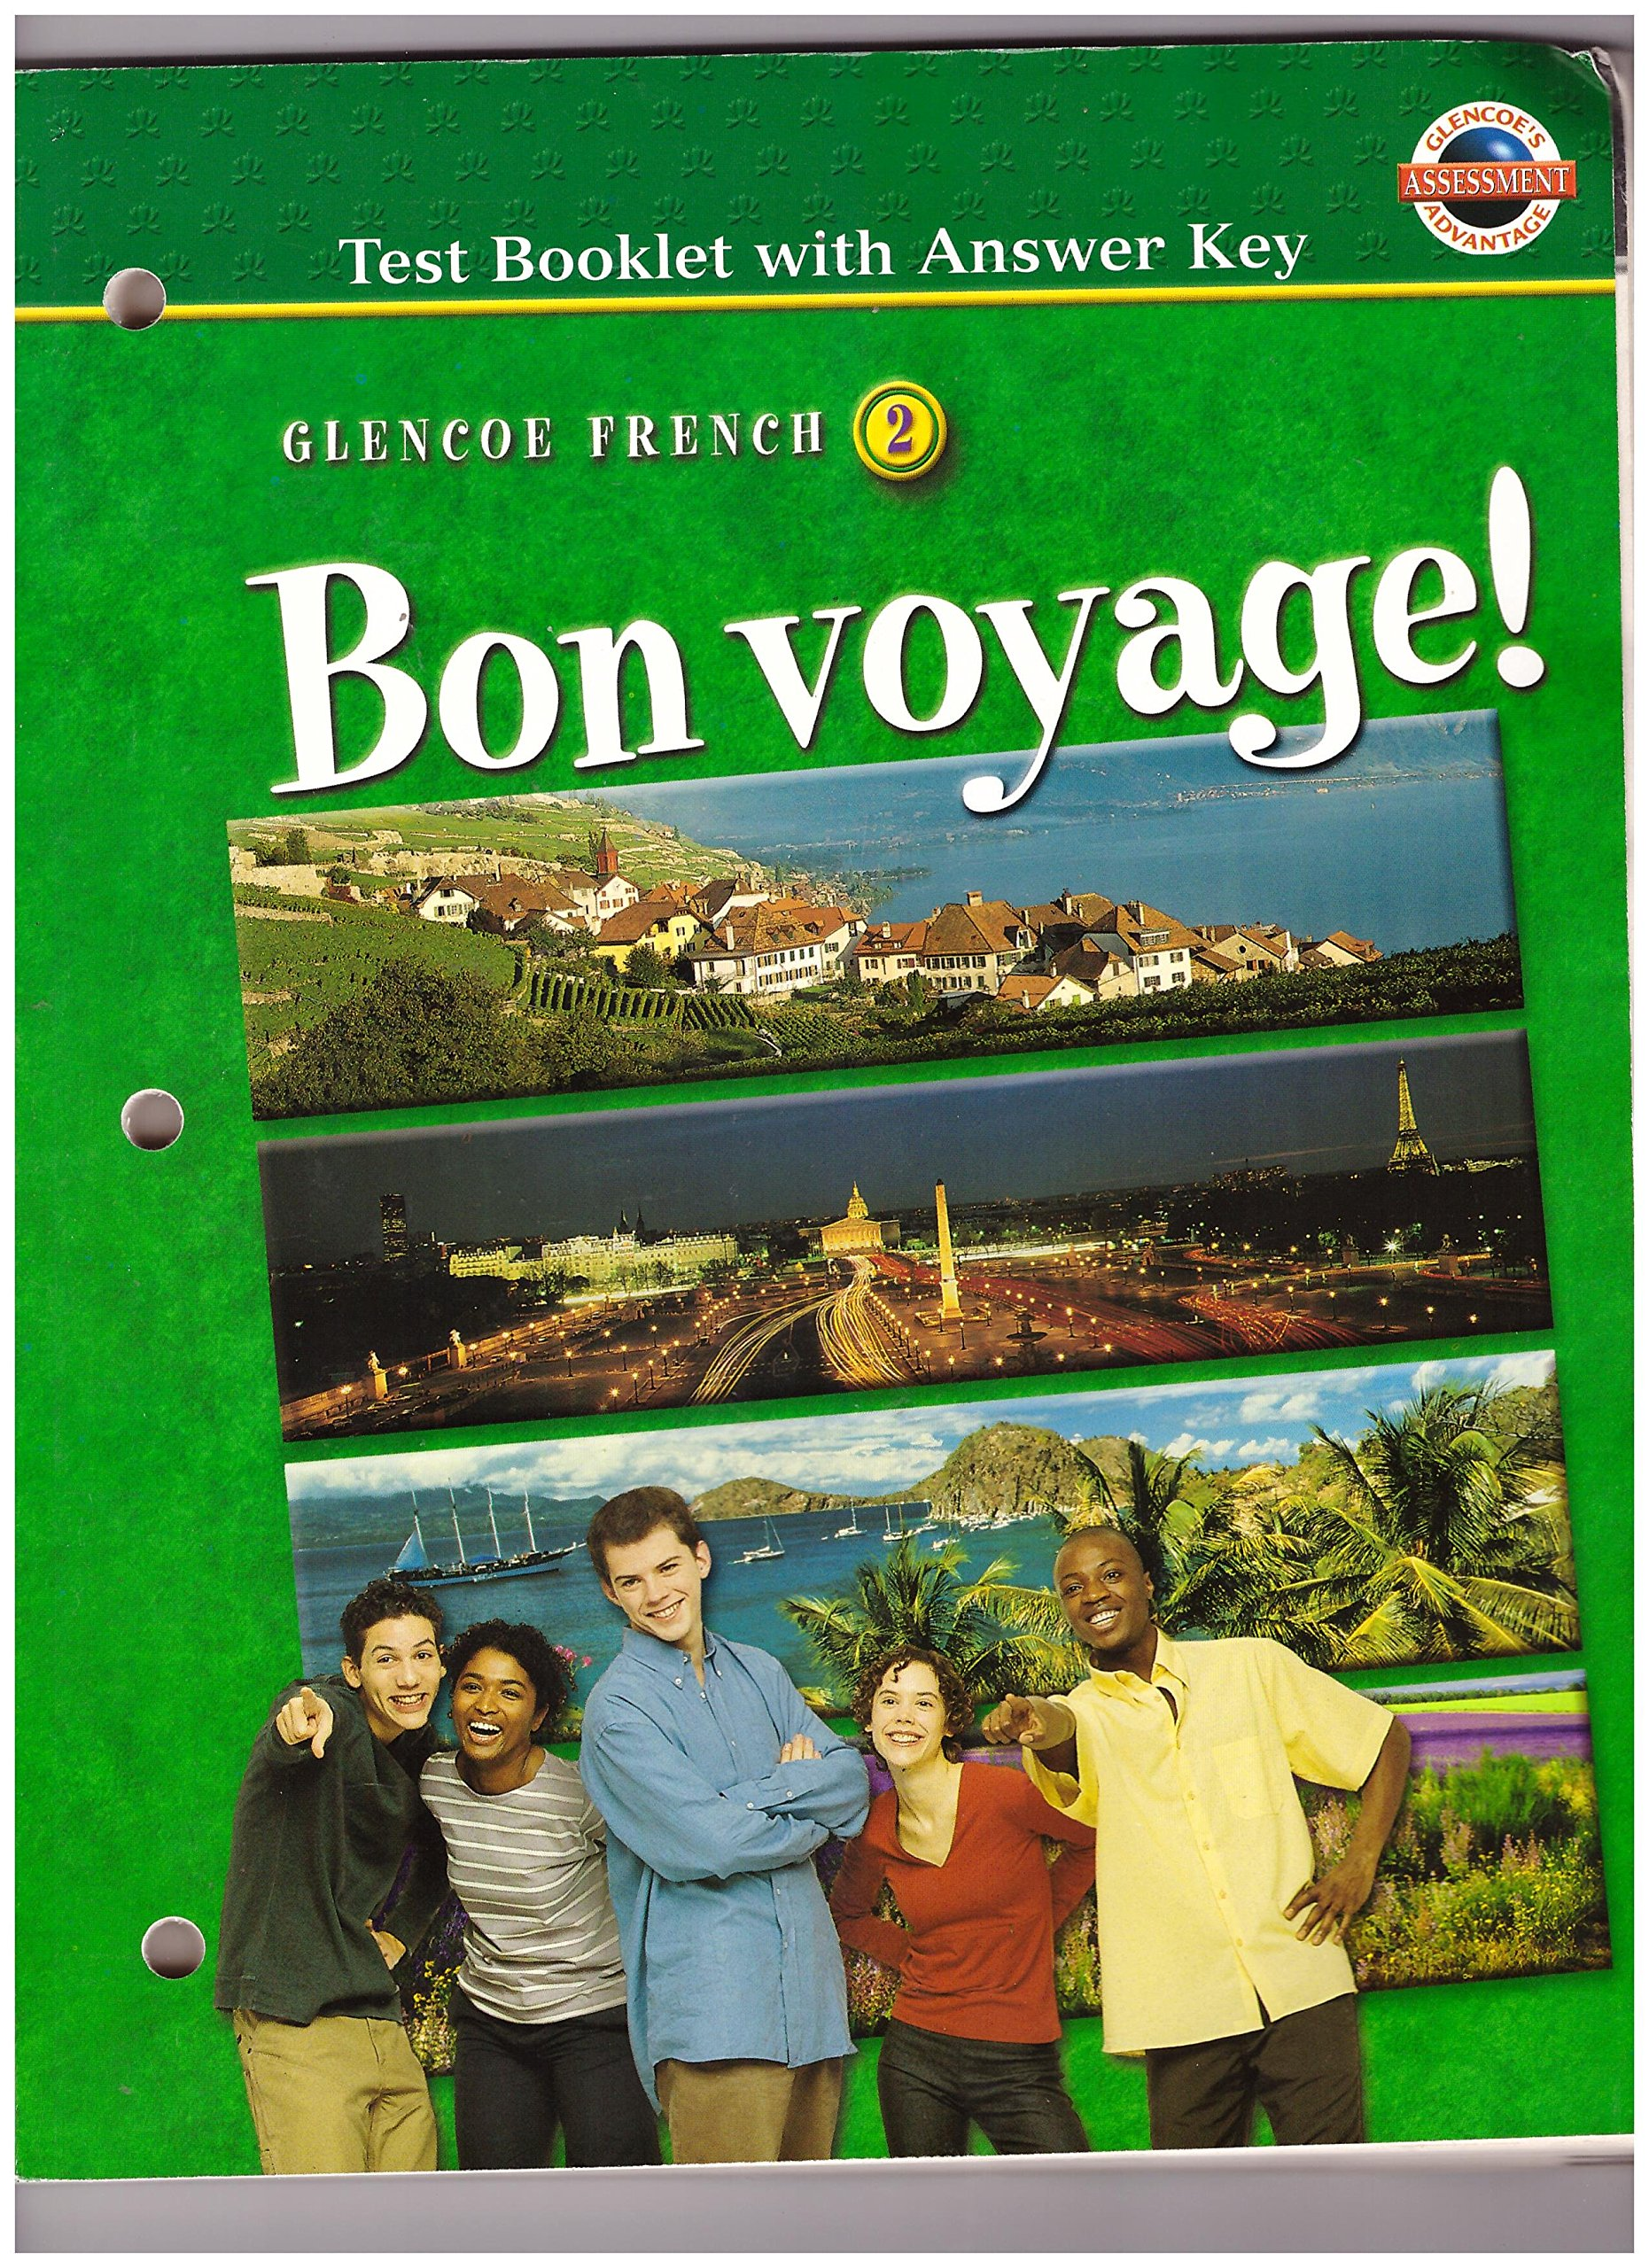 glencoe french 2 bon voyage workbook answer key